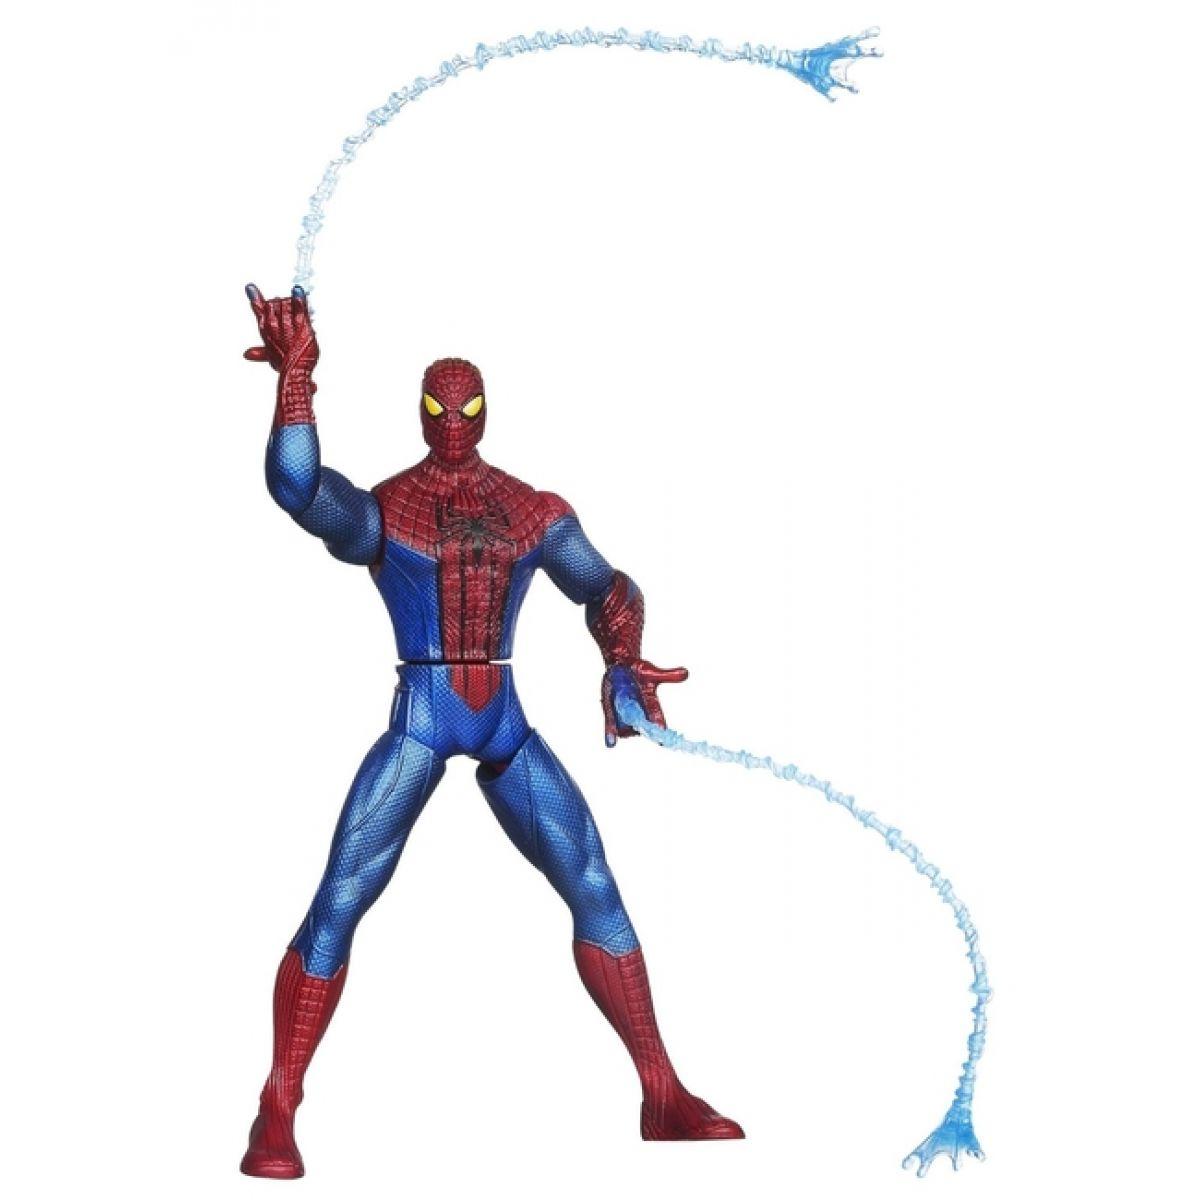 Spiderman kolekce figurek s doplňky Hasbro 37202 - Spiderman 37265